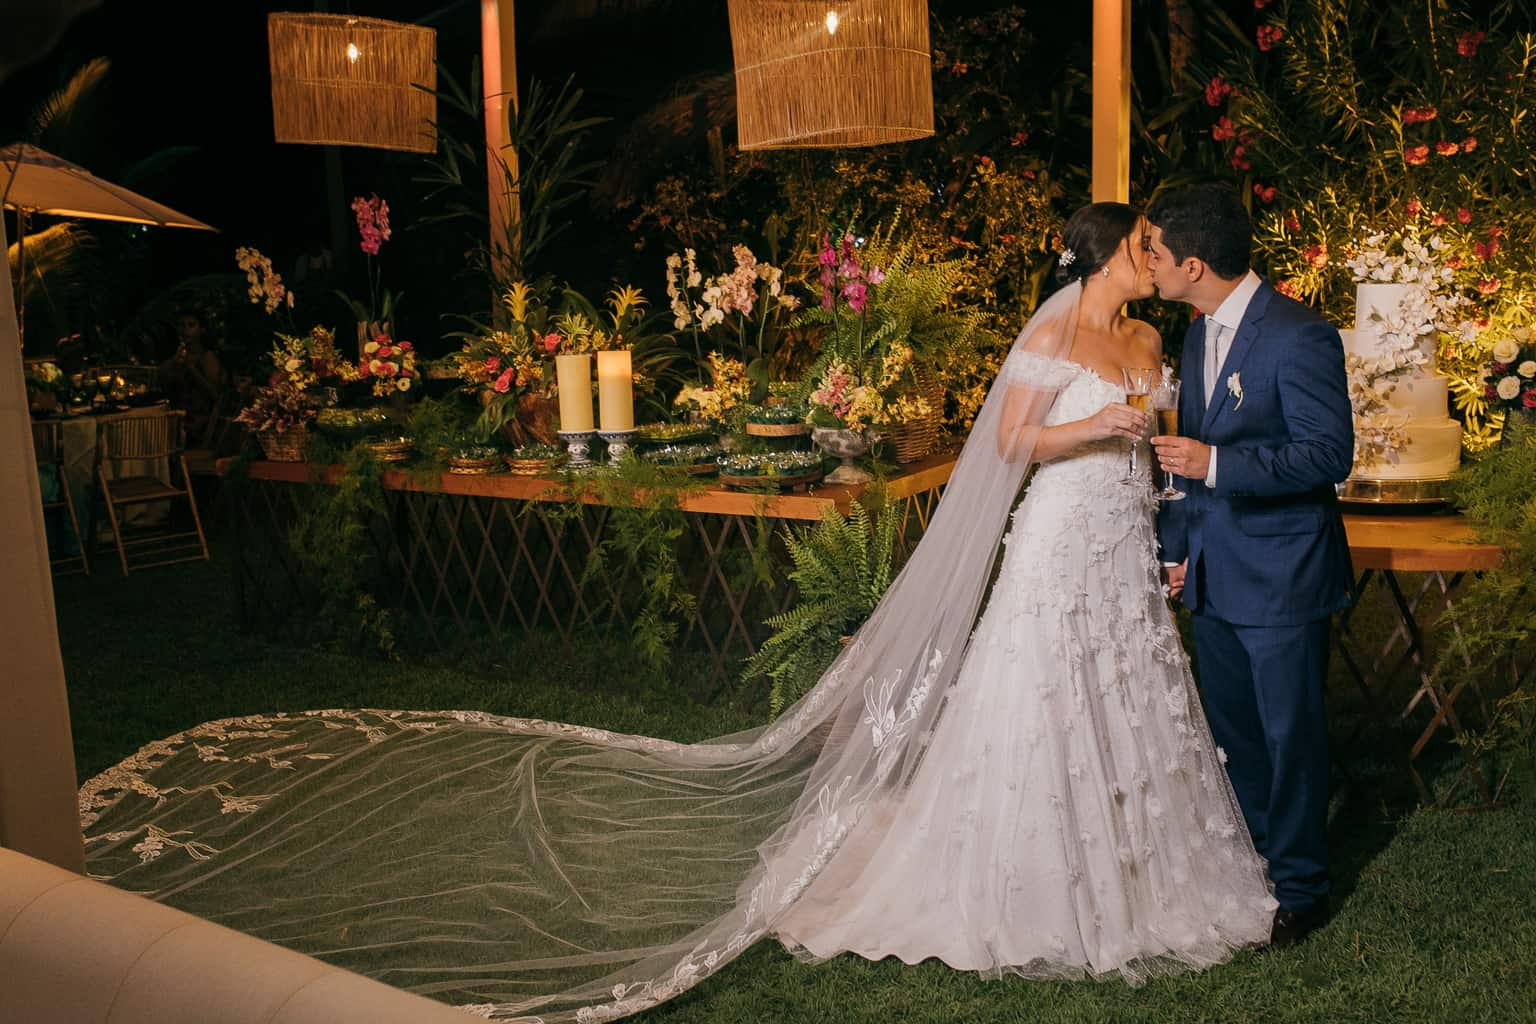 Casamento-Gardenia-e-Marcos-Antonio-Paulo-Bezerra-Joao-Curvelo-Carol-Maiorano1442